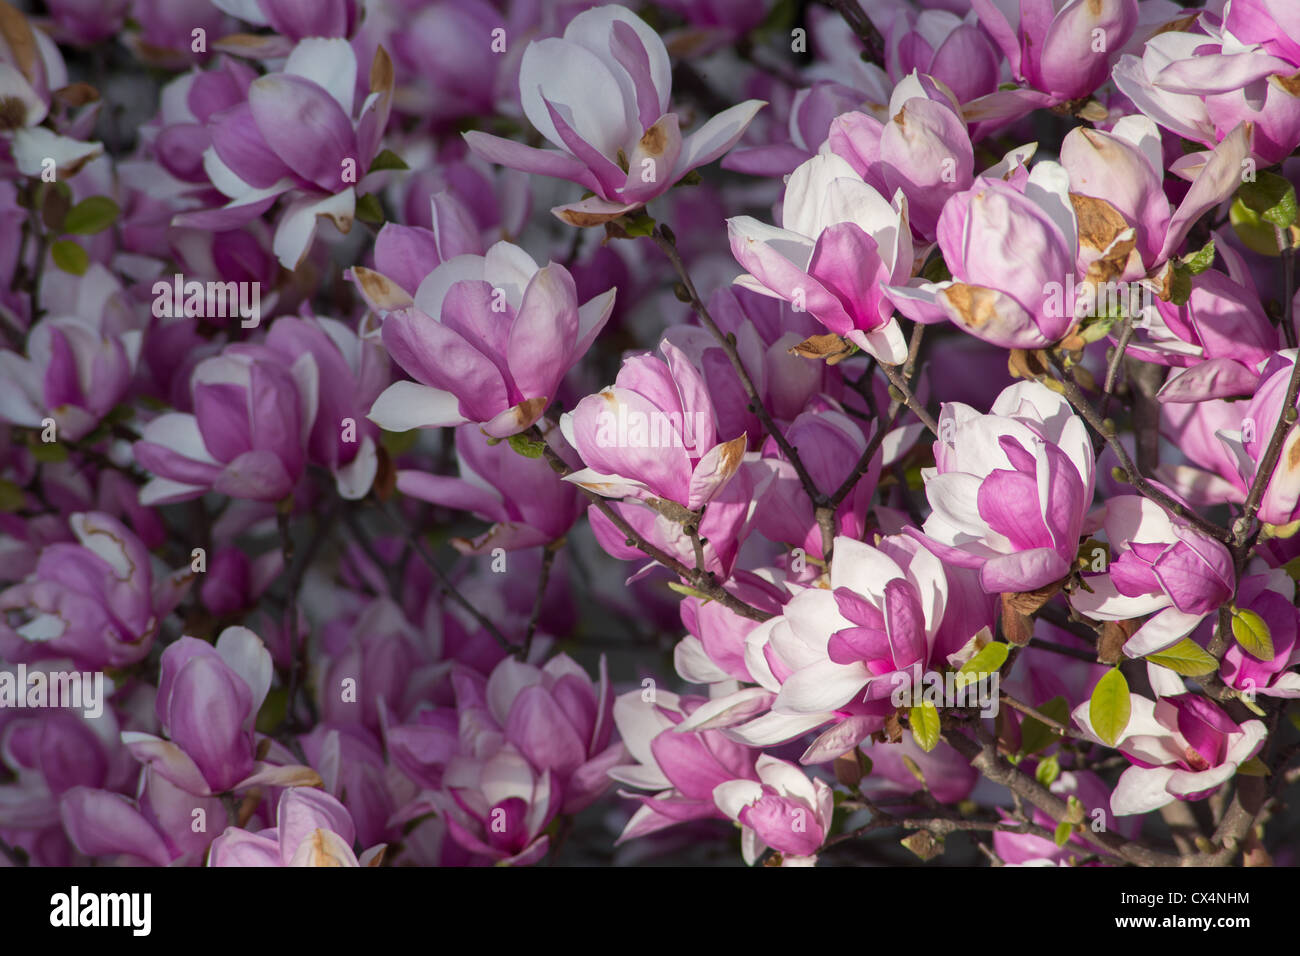 Purple lily magnolia flowers in south korea stock photo 50506560 purple lily magnolia flowers in south korea izmirmasajfo